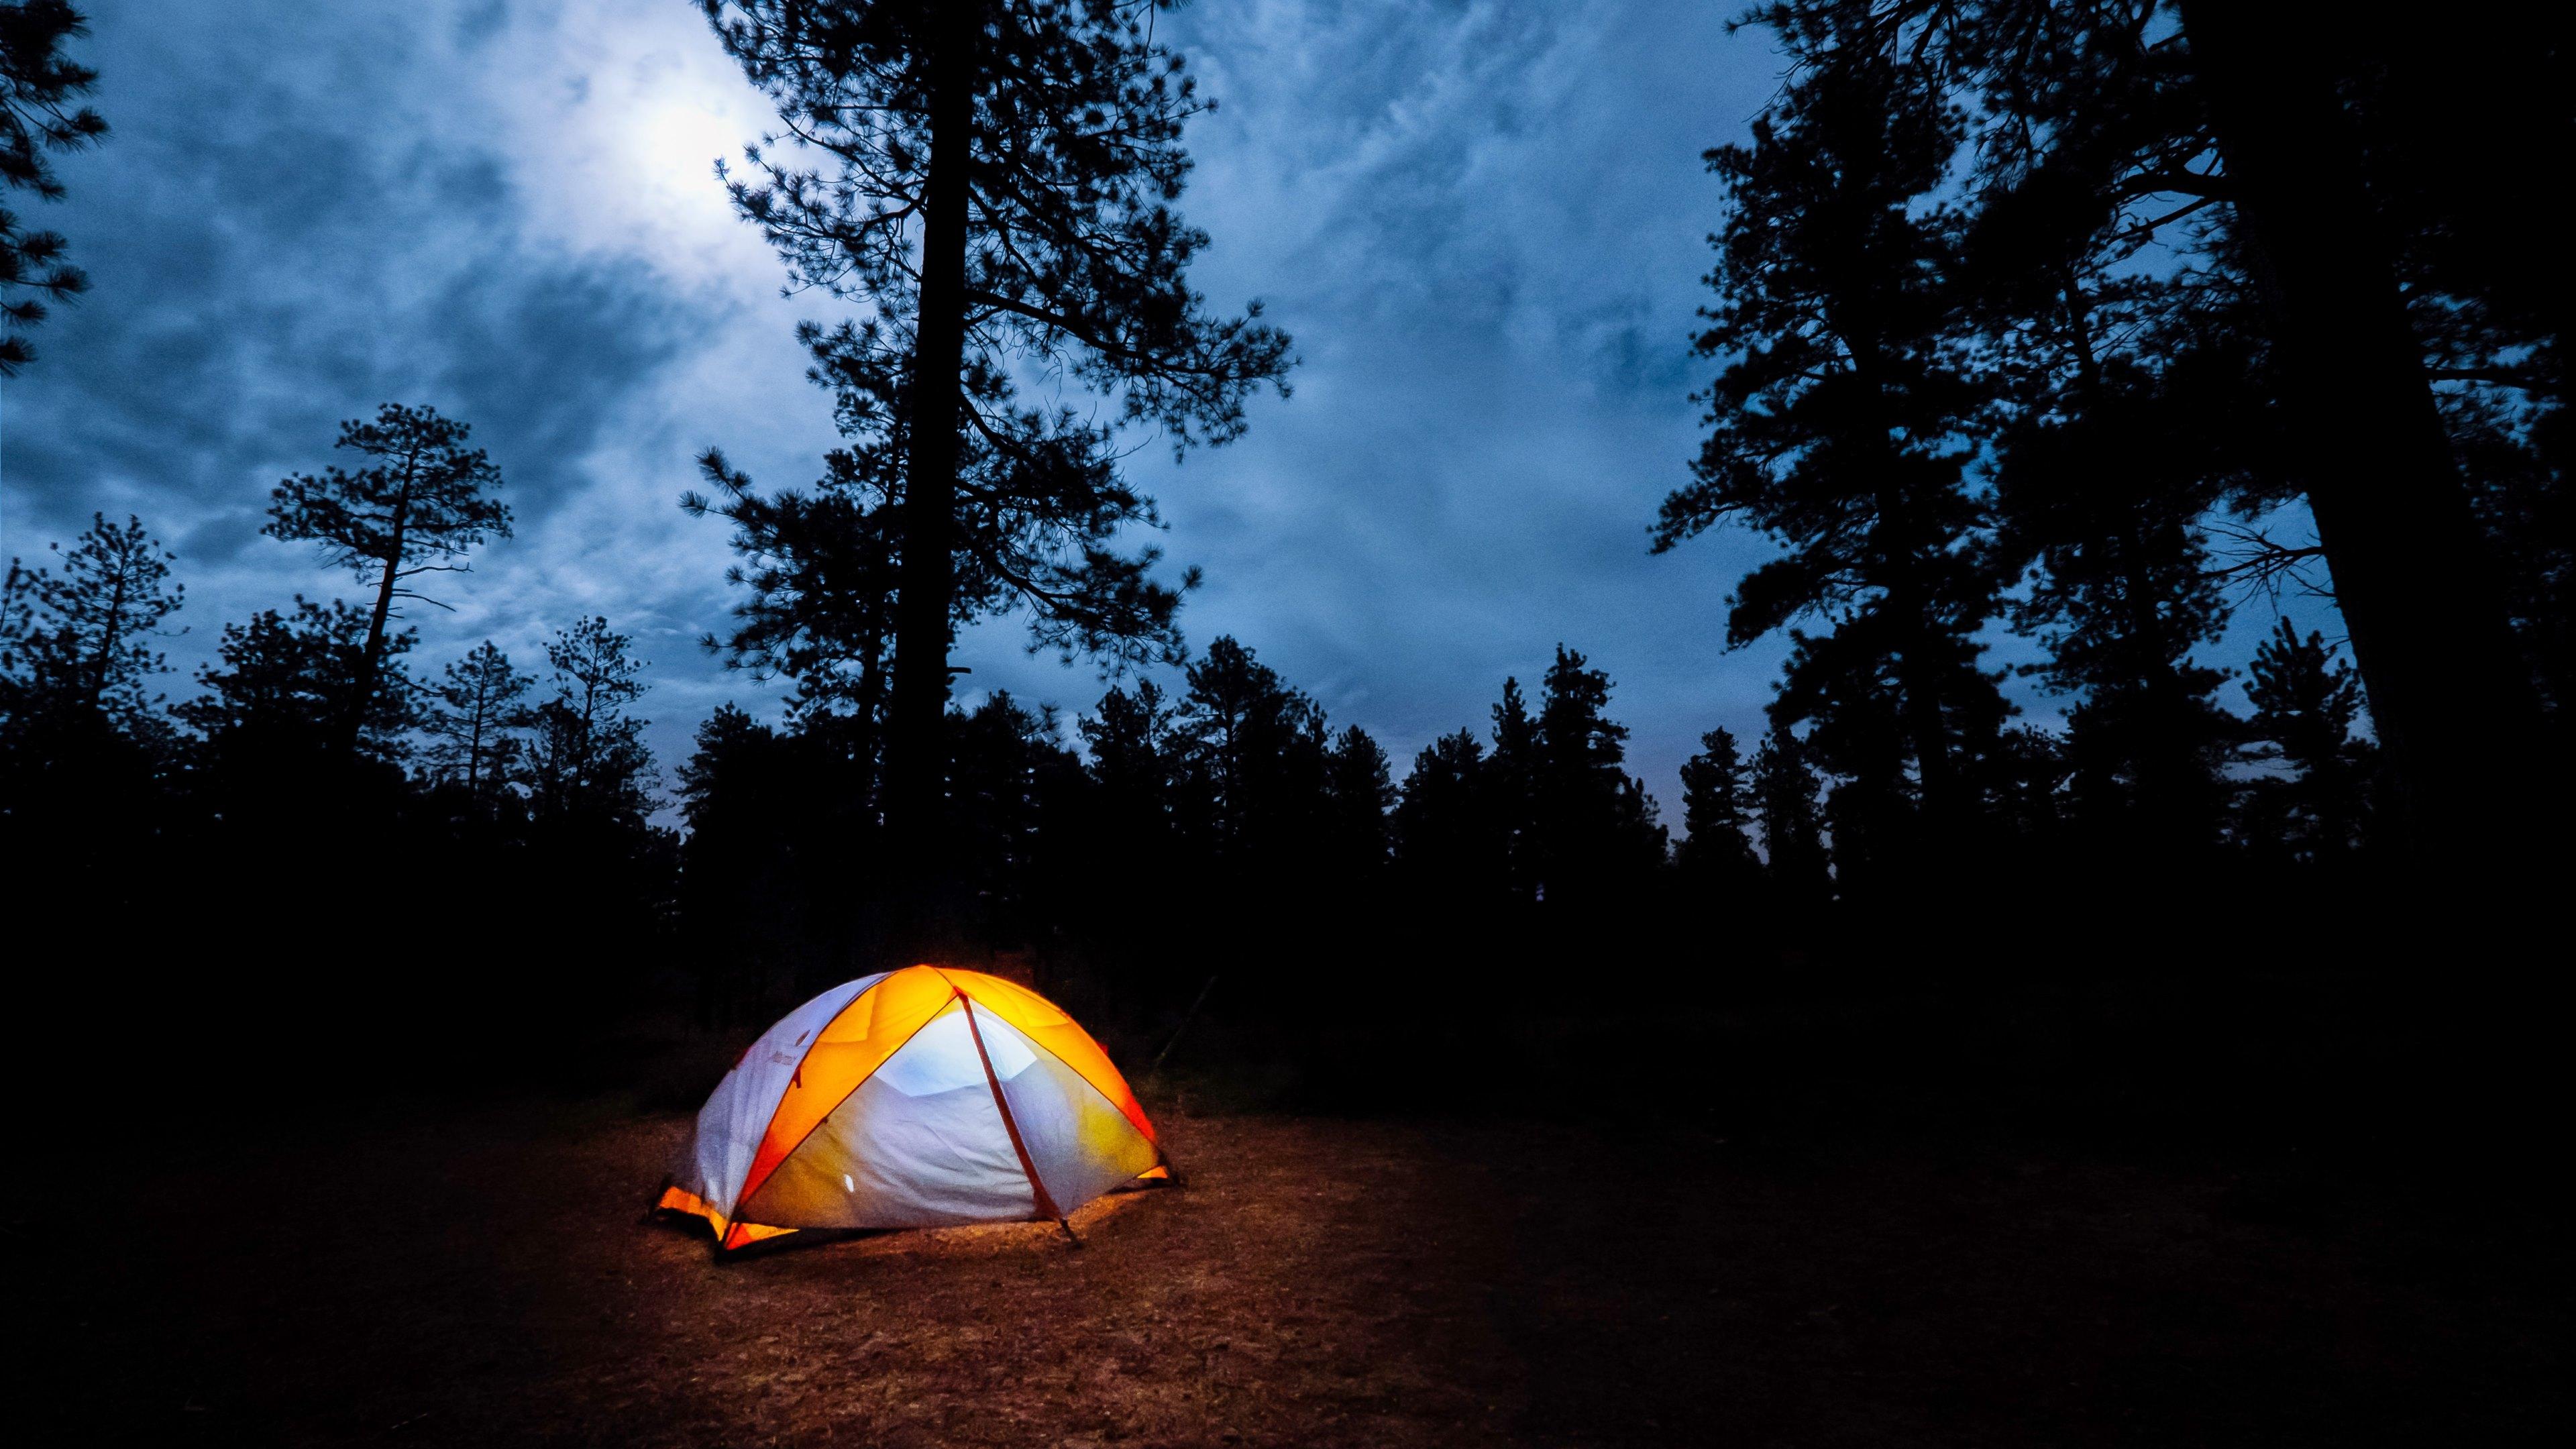 tent camping nature widescreen wallpaper 65764